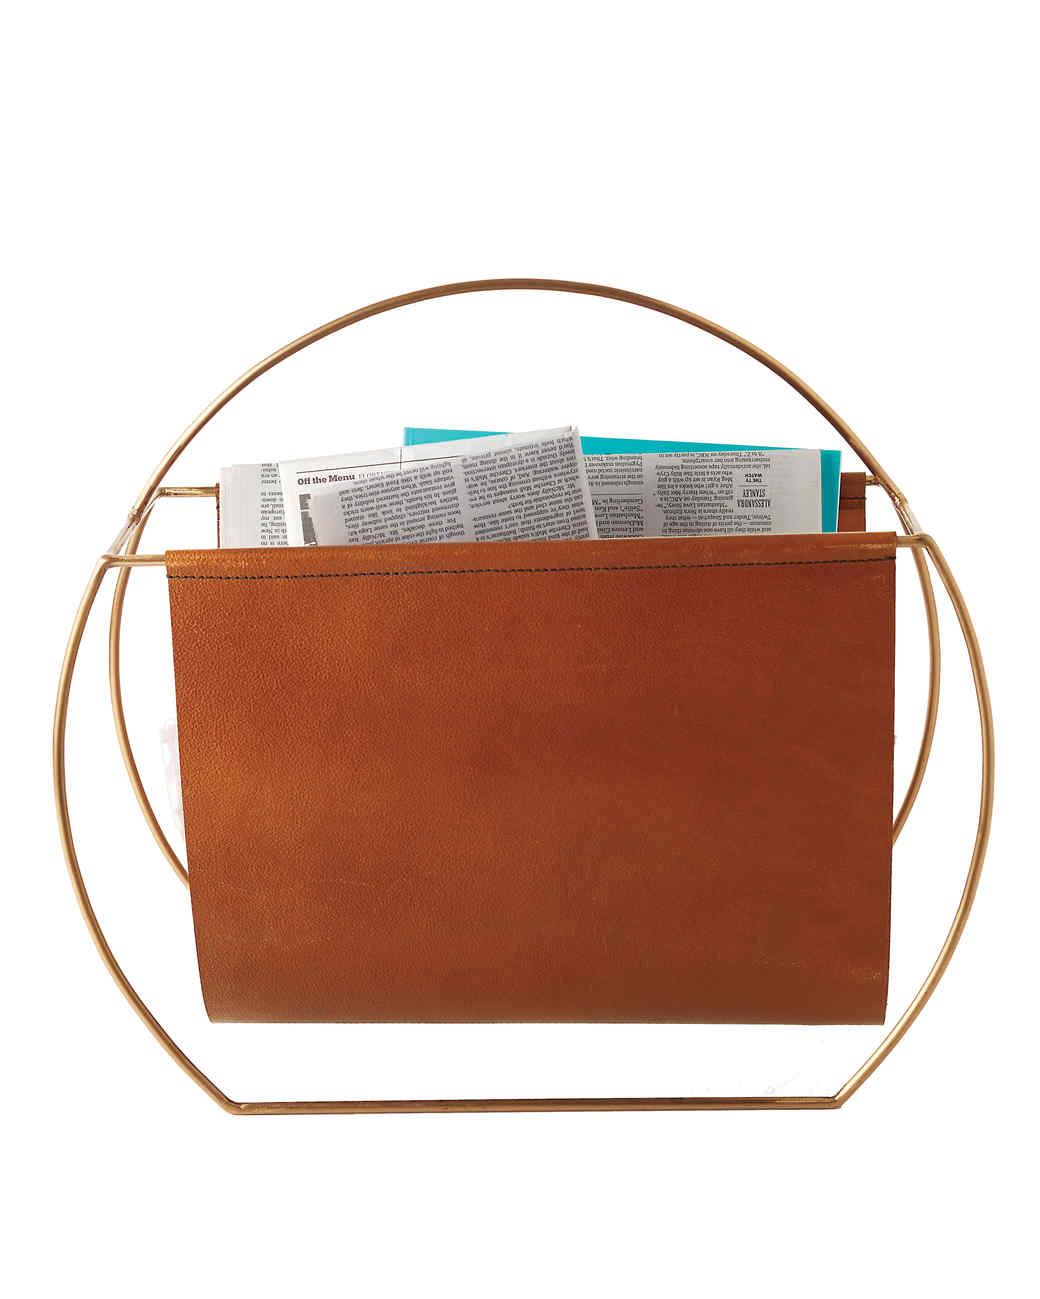 leather-magazine-rack-083-d111615.jpg